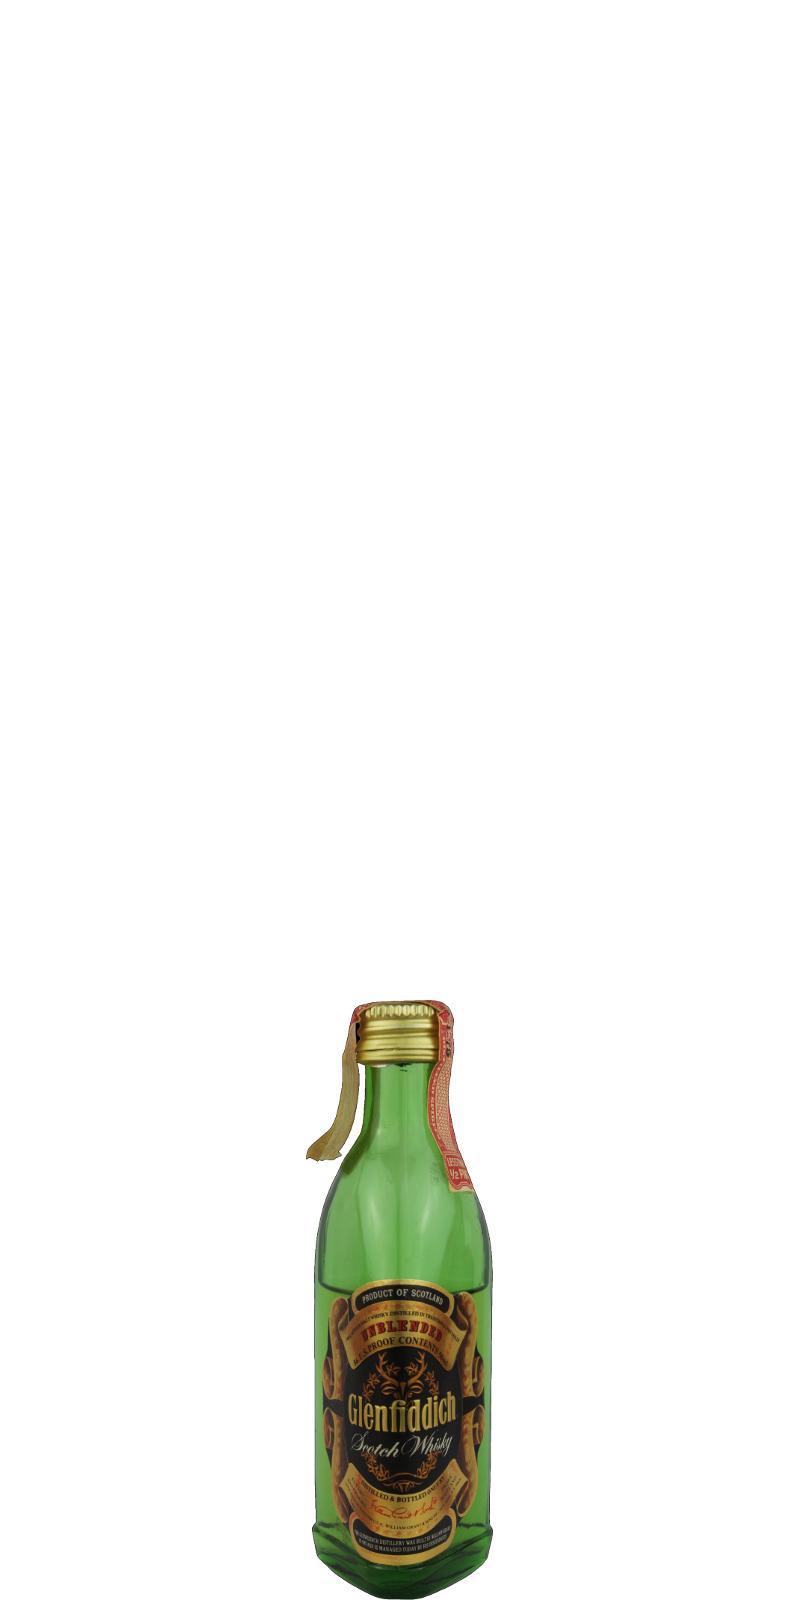 Glenfiddich Unblended Scotch Whisky